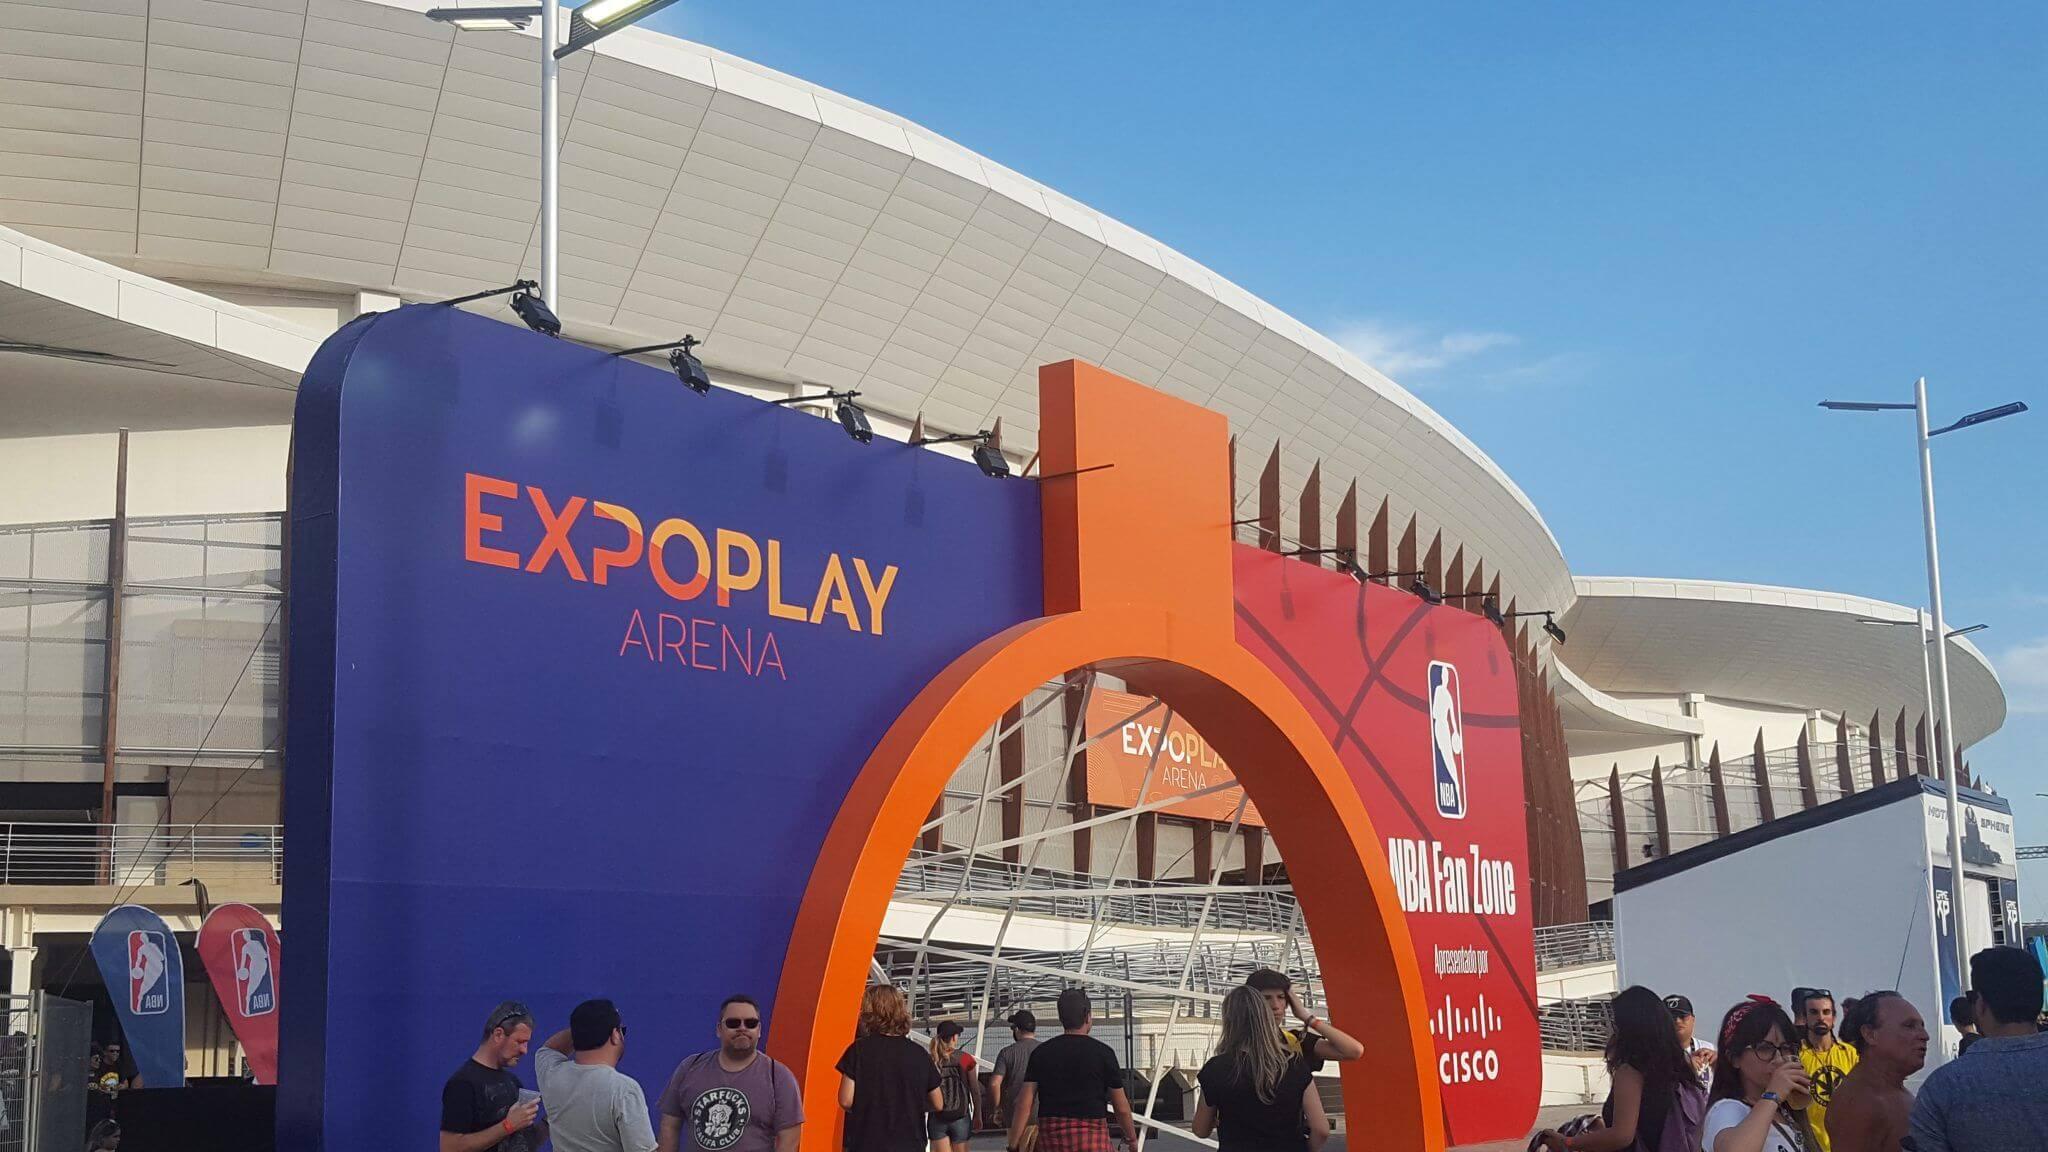 Game XP4 - Game XP: Evento mostra que o mundo dos games também é rock n roll